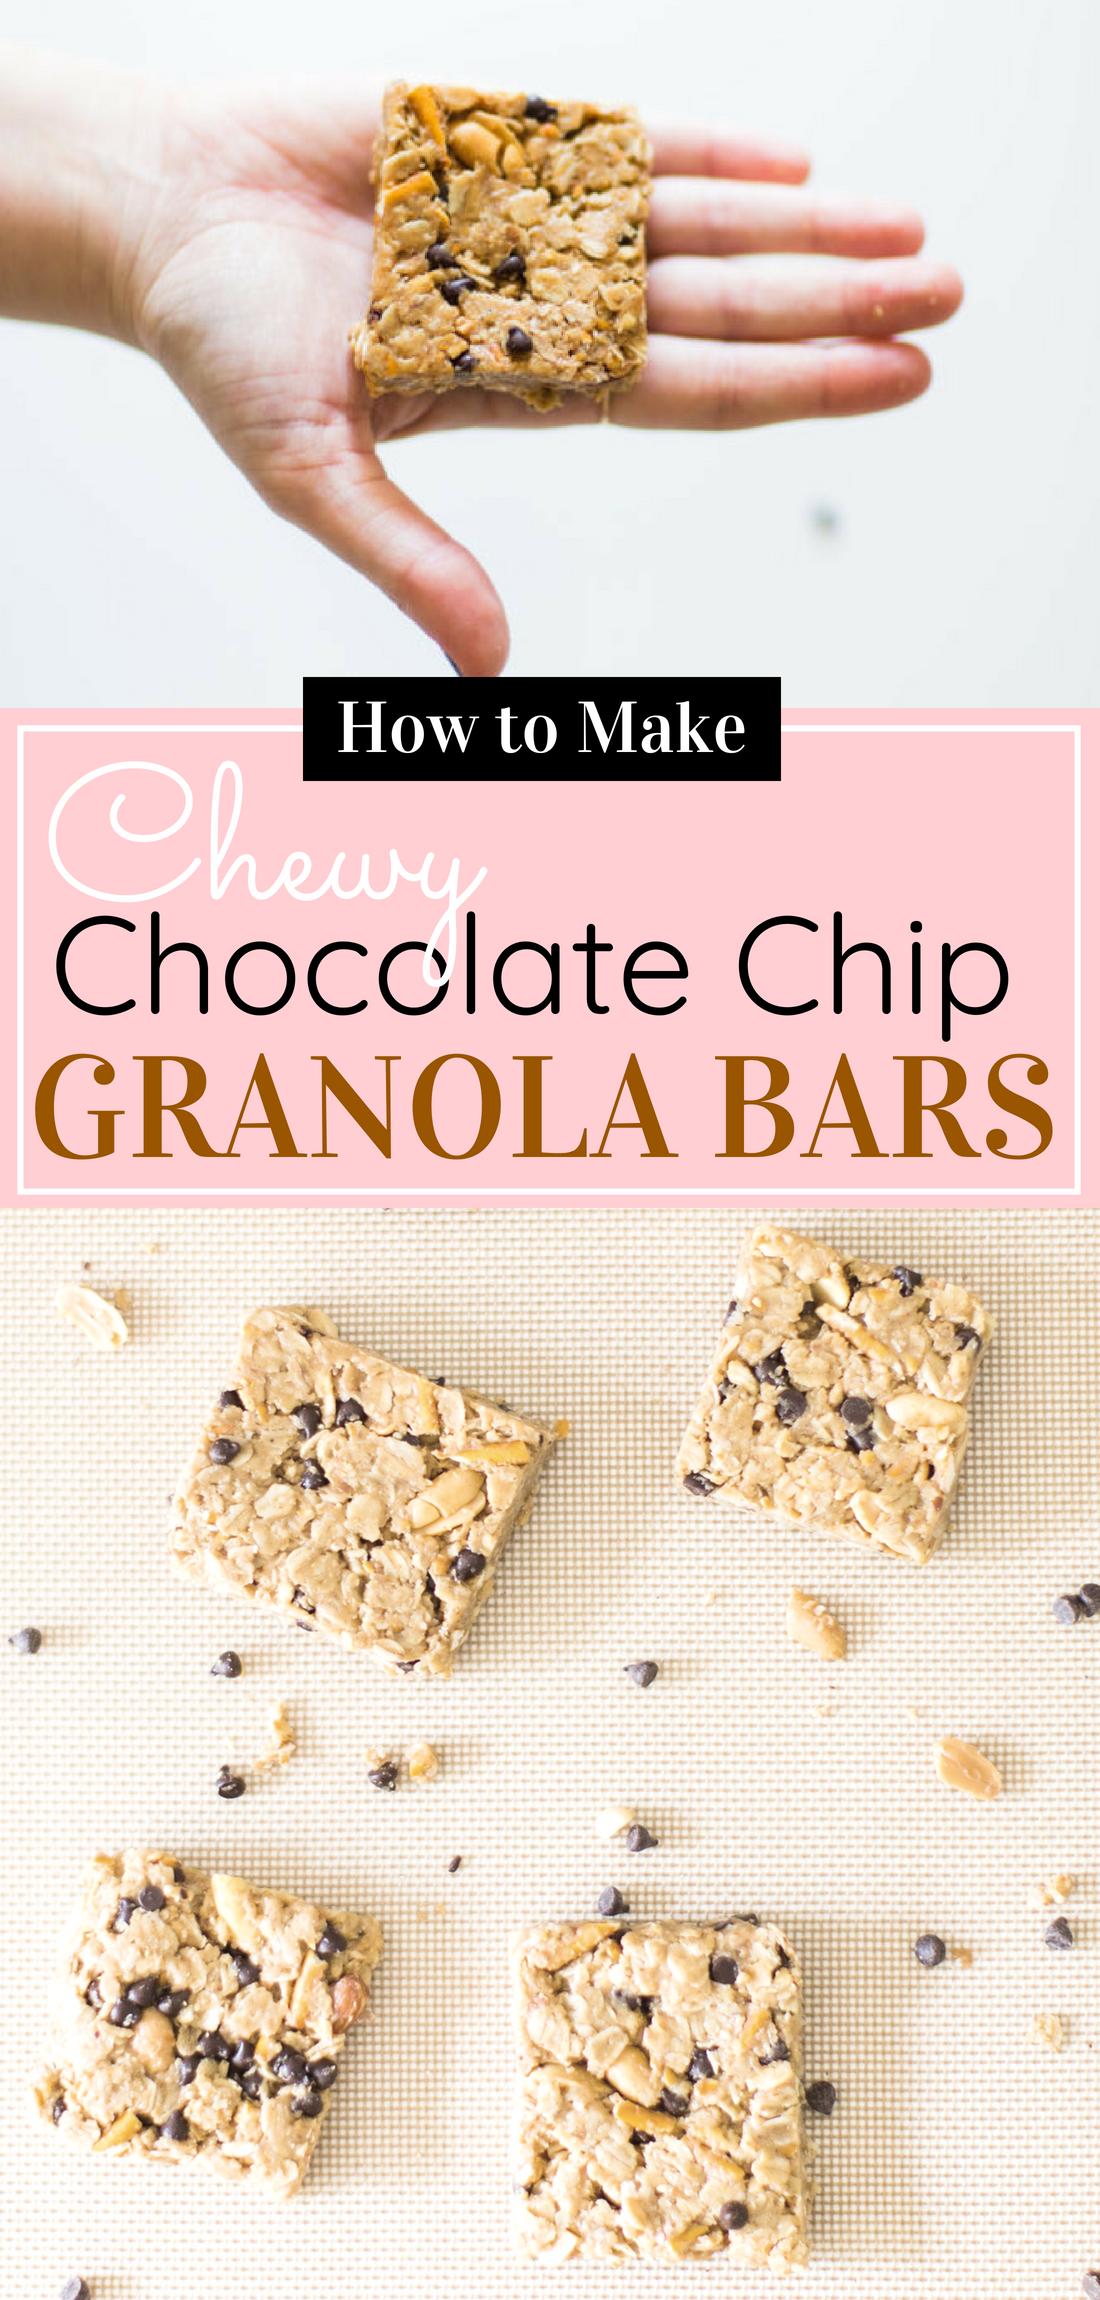 How to make our favorite dairy-free soft chocolate chip pretzel granola bars. Click through for the easy recipe. #granolabars #homemadegranolabars #dairyfree #homemadesnack | glitterinc.com | @glitterinc